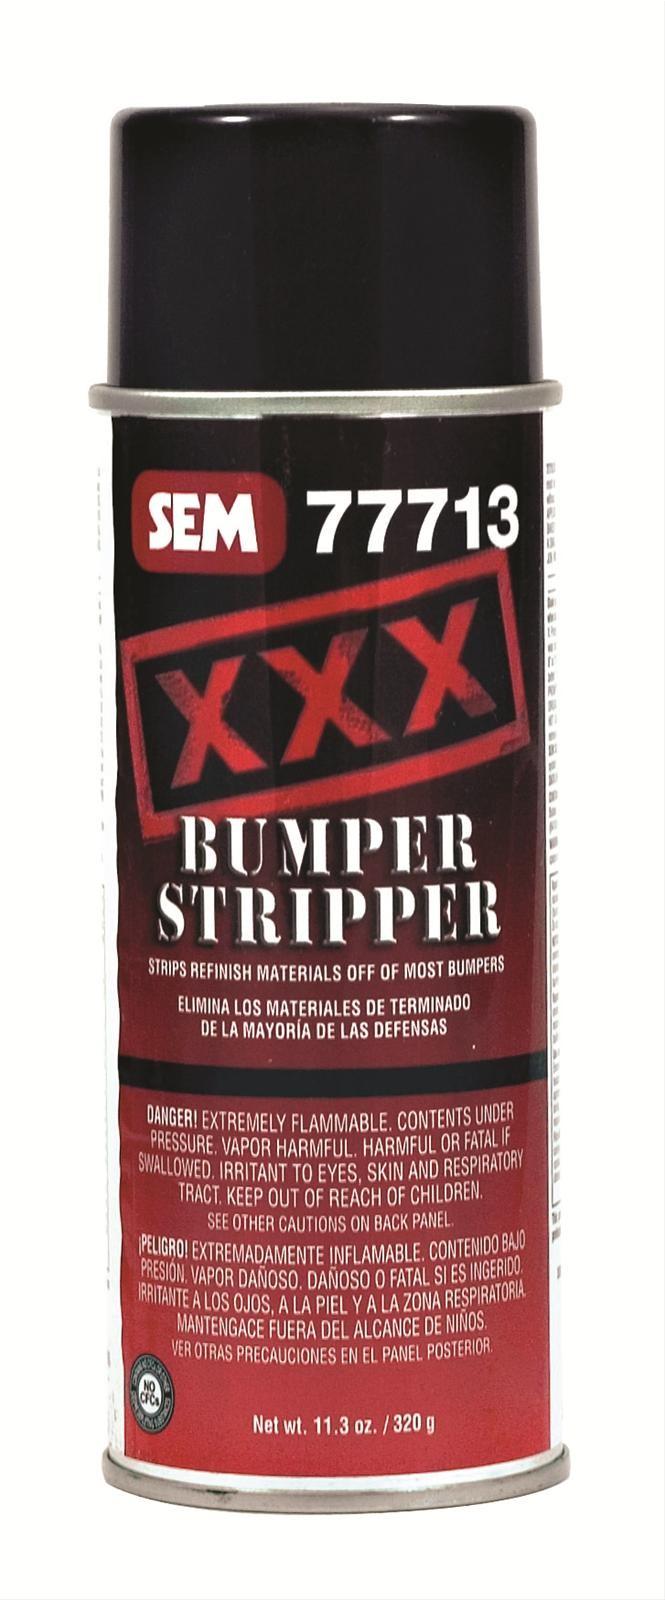 XXX Bumper Stripper 16 oz.